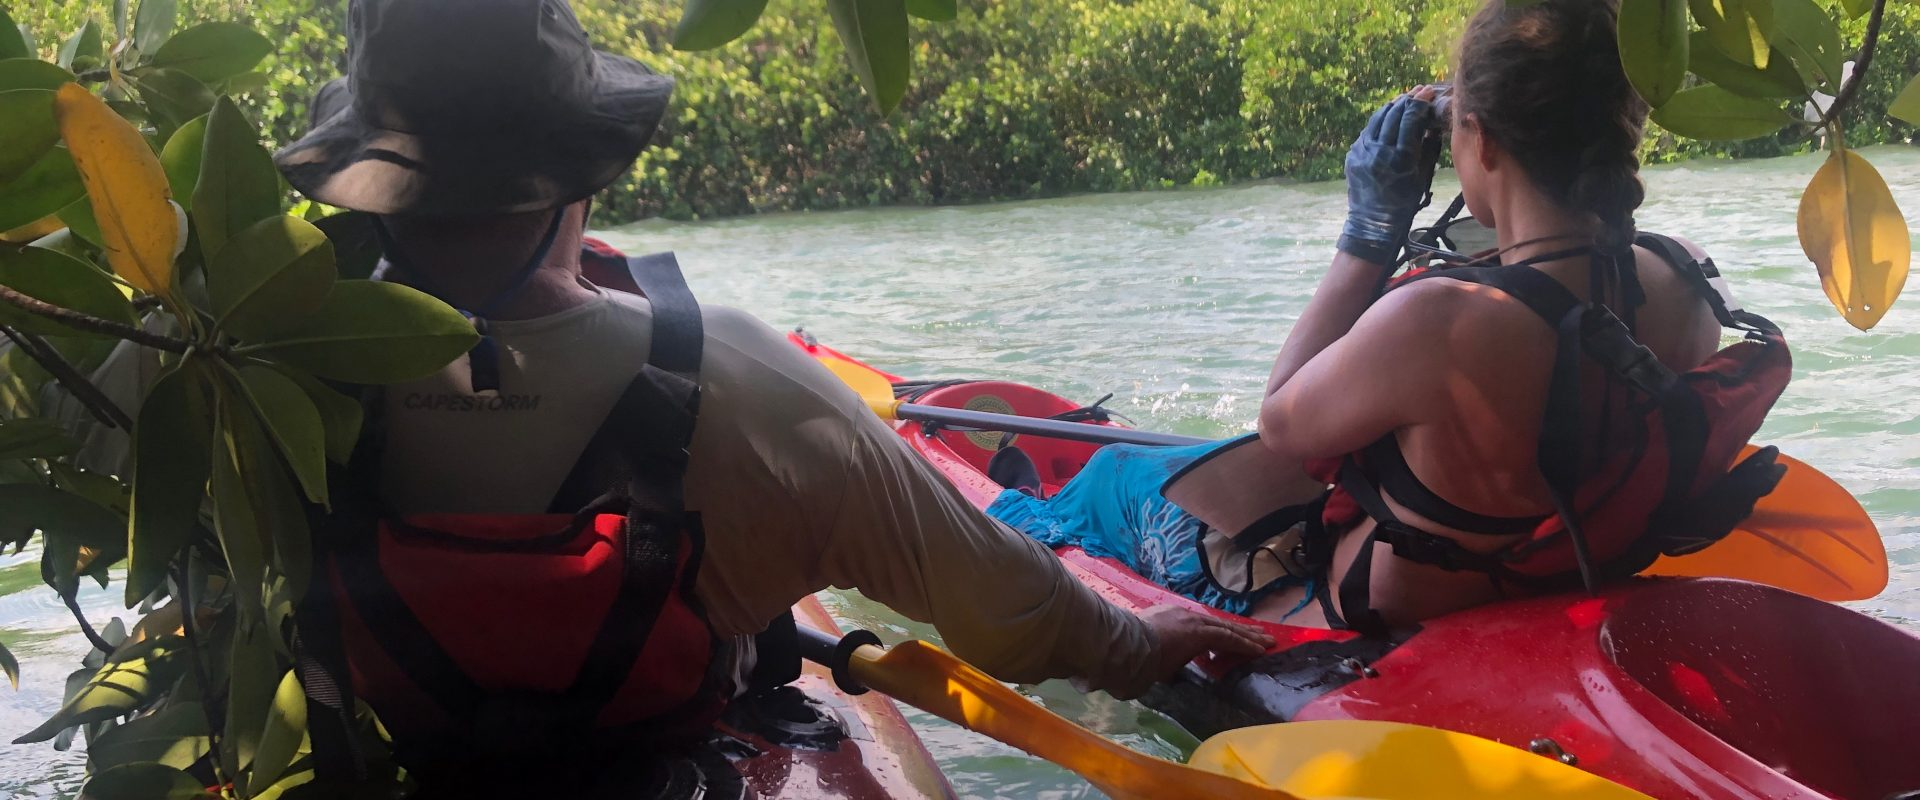 Kayak and Camping 5 Day Safari throughout Menai Bay Conservation Area (US$950/person)